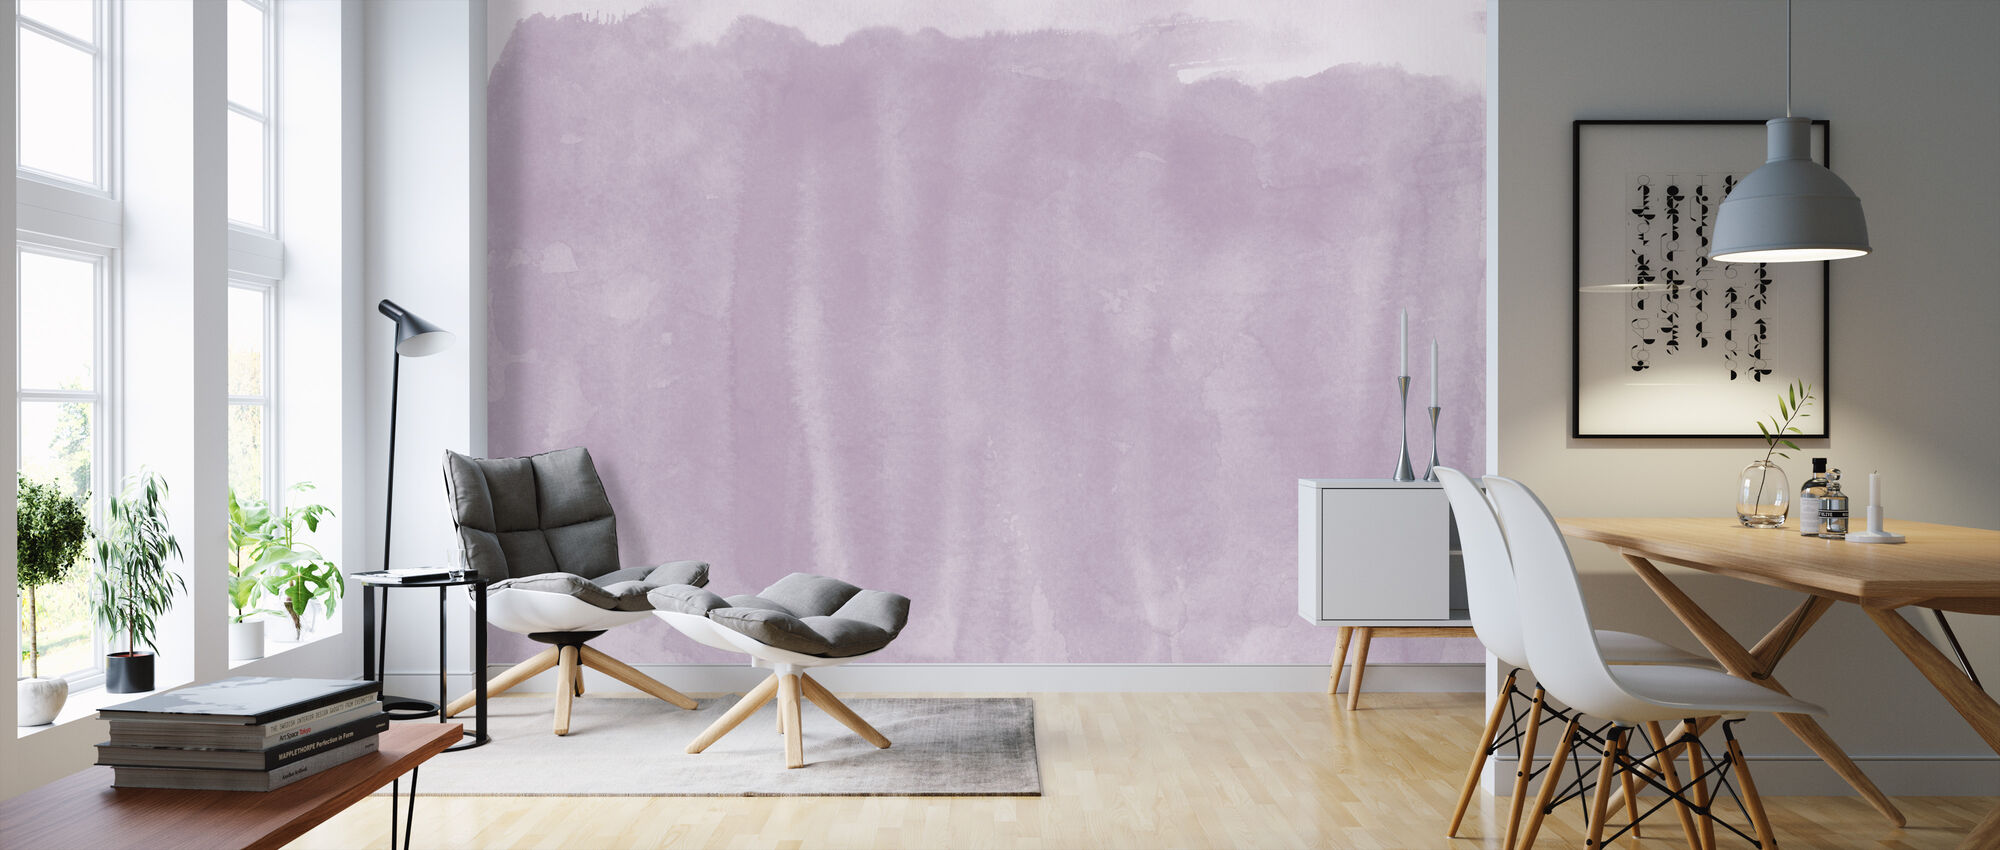 Watercolor Minimalism VIIII - Wallpaper - Living Room